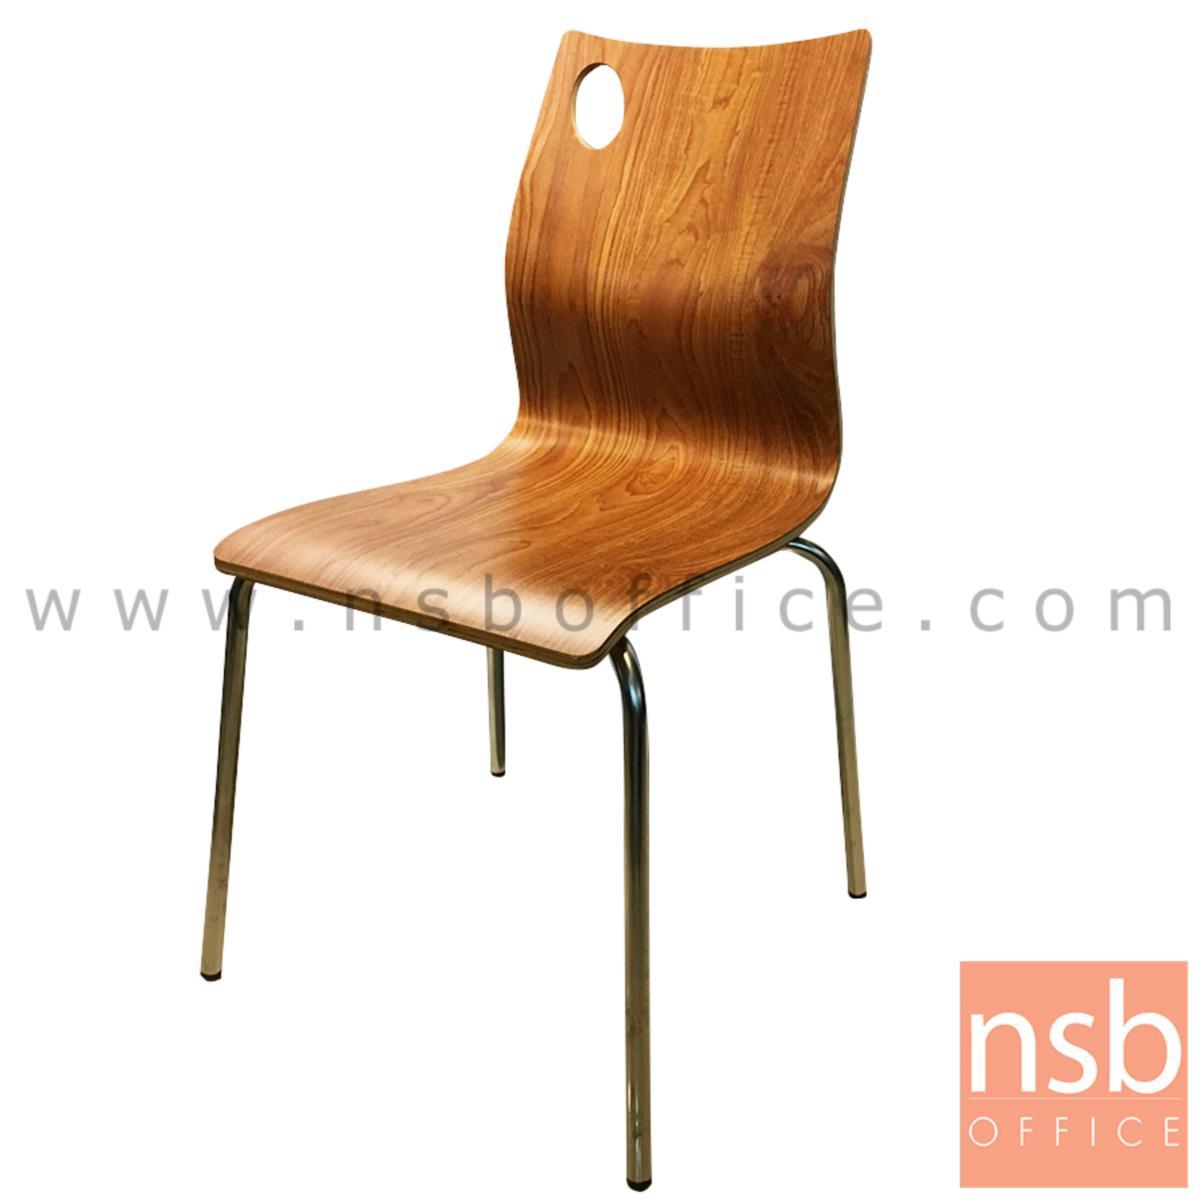 B20A079:เก้าอี้อเนกประสงค์ไม้ดัด รุ่น Herrmann (เฮอร์มานน์) ขนาด 80H cm.  ขาสเตนเลส